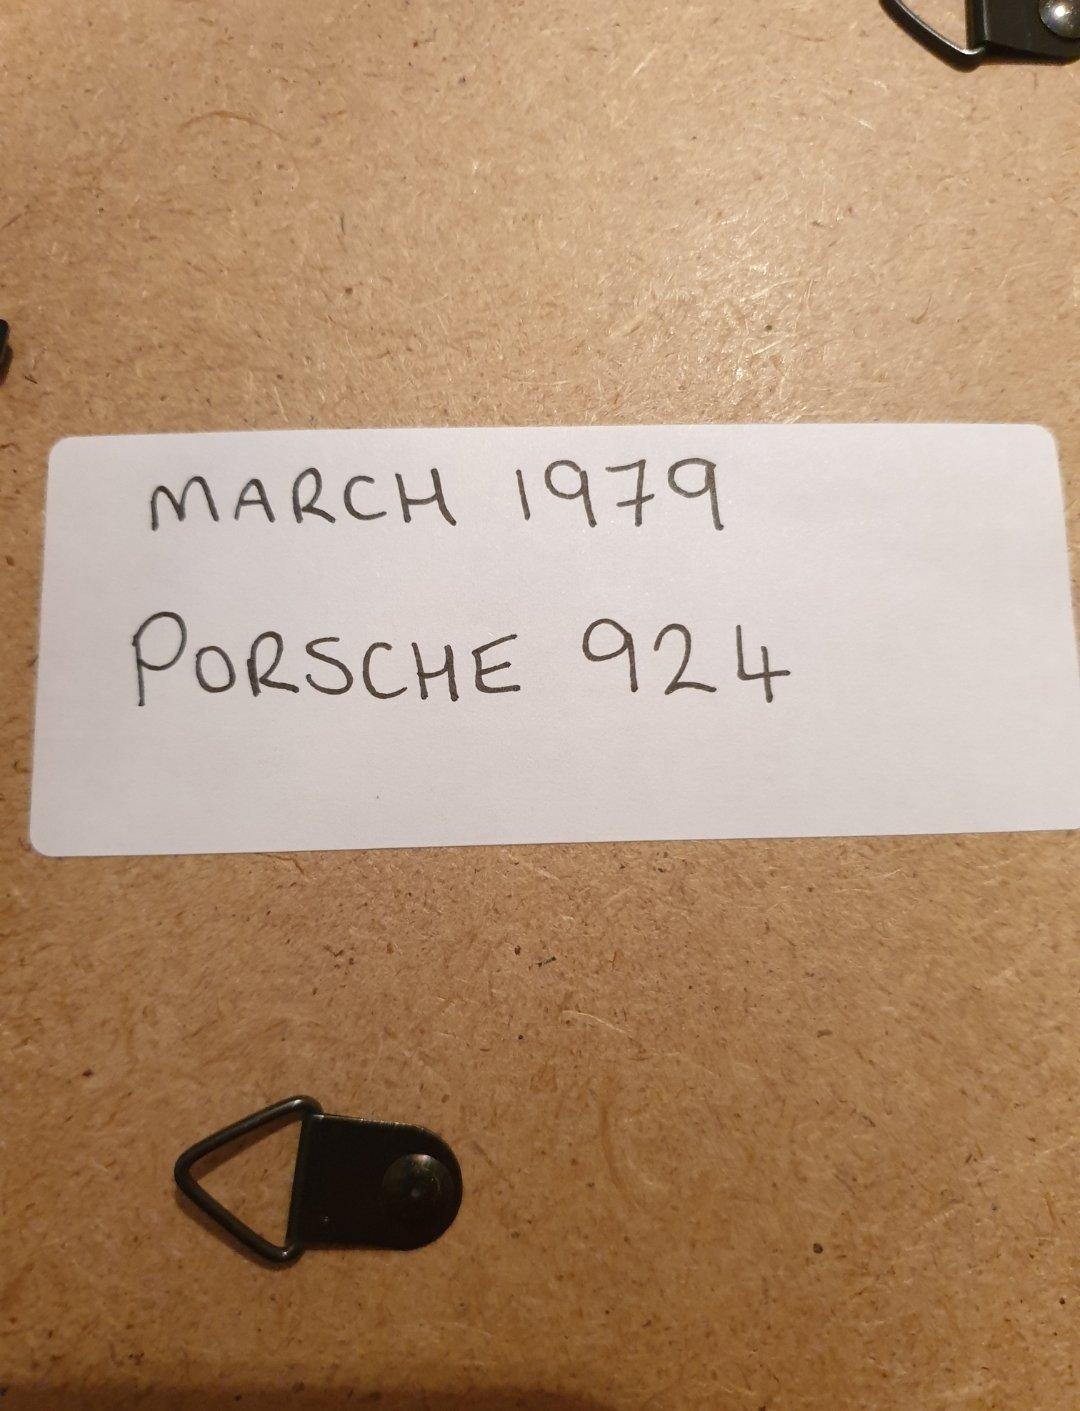 1979 Original Porsche 924 Framed Advert For Sale (picture 2 of 2)